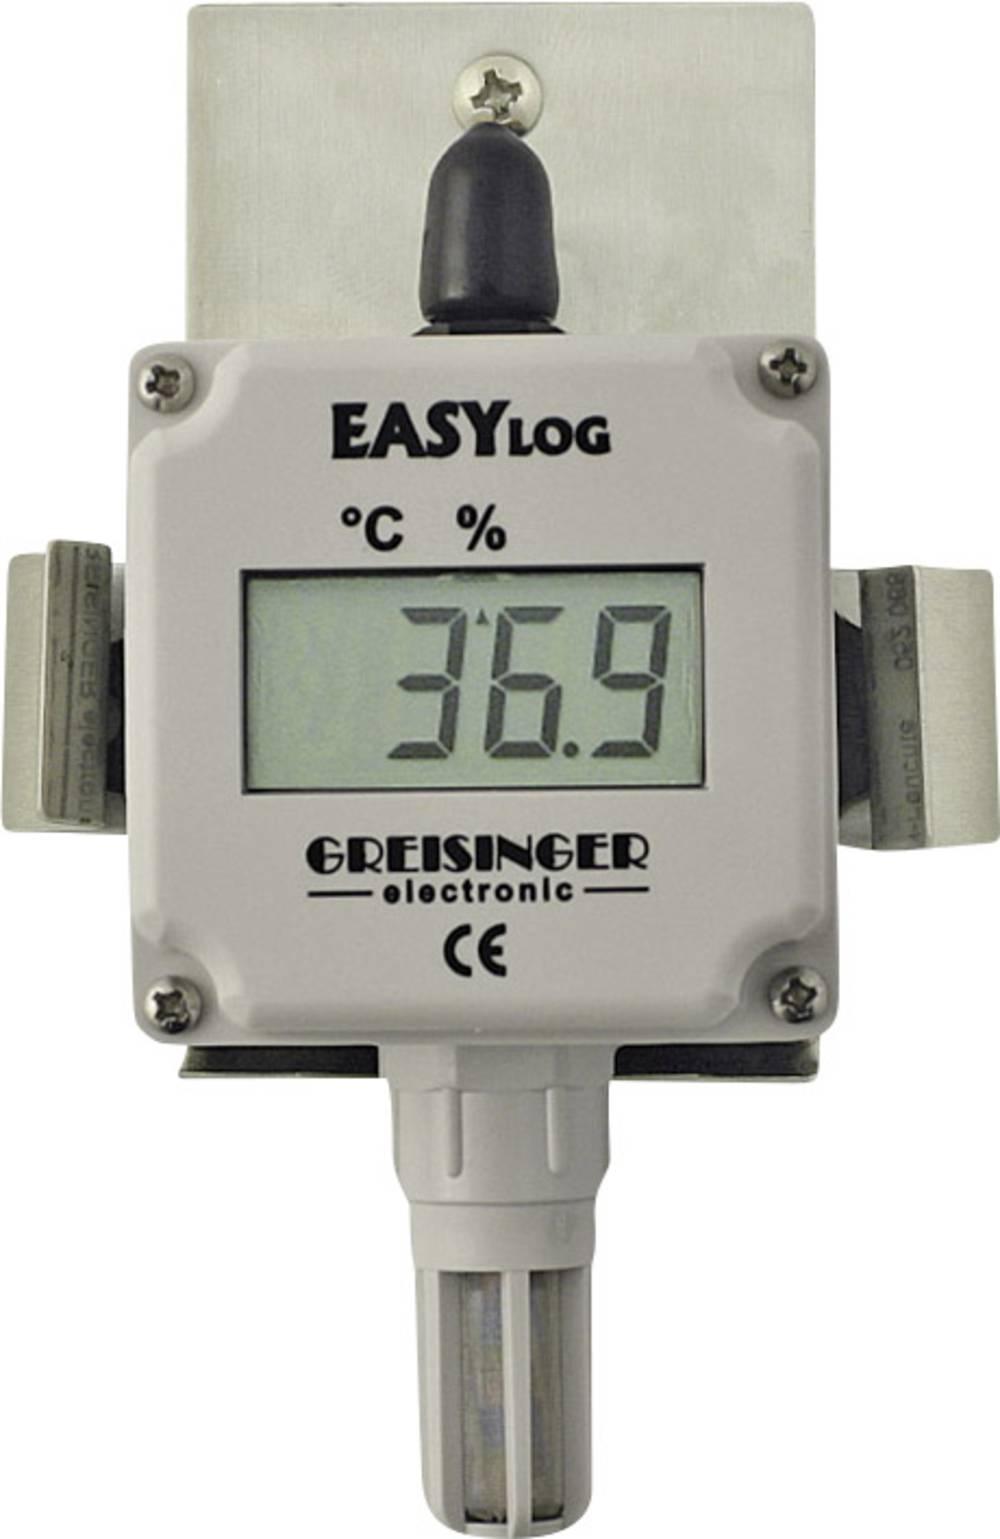 Greisinger GWH 10 stensko držalo GWH 10 primerno za Greisinger, serija EASYLog 603300